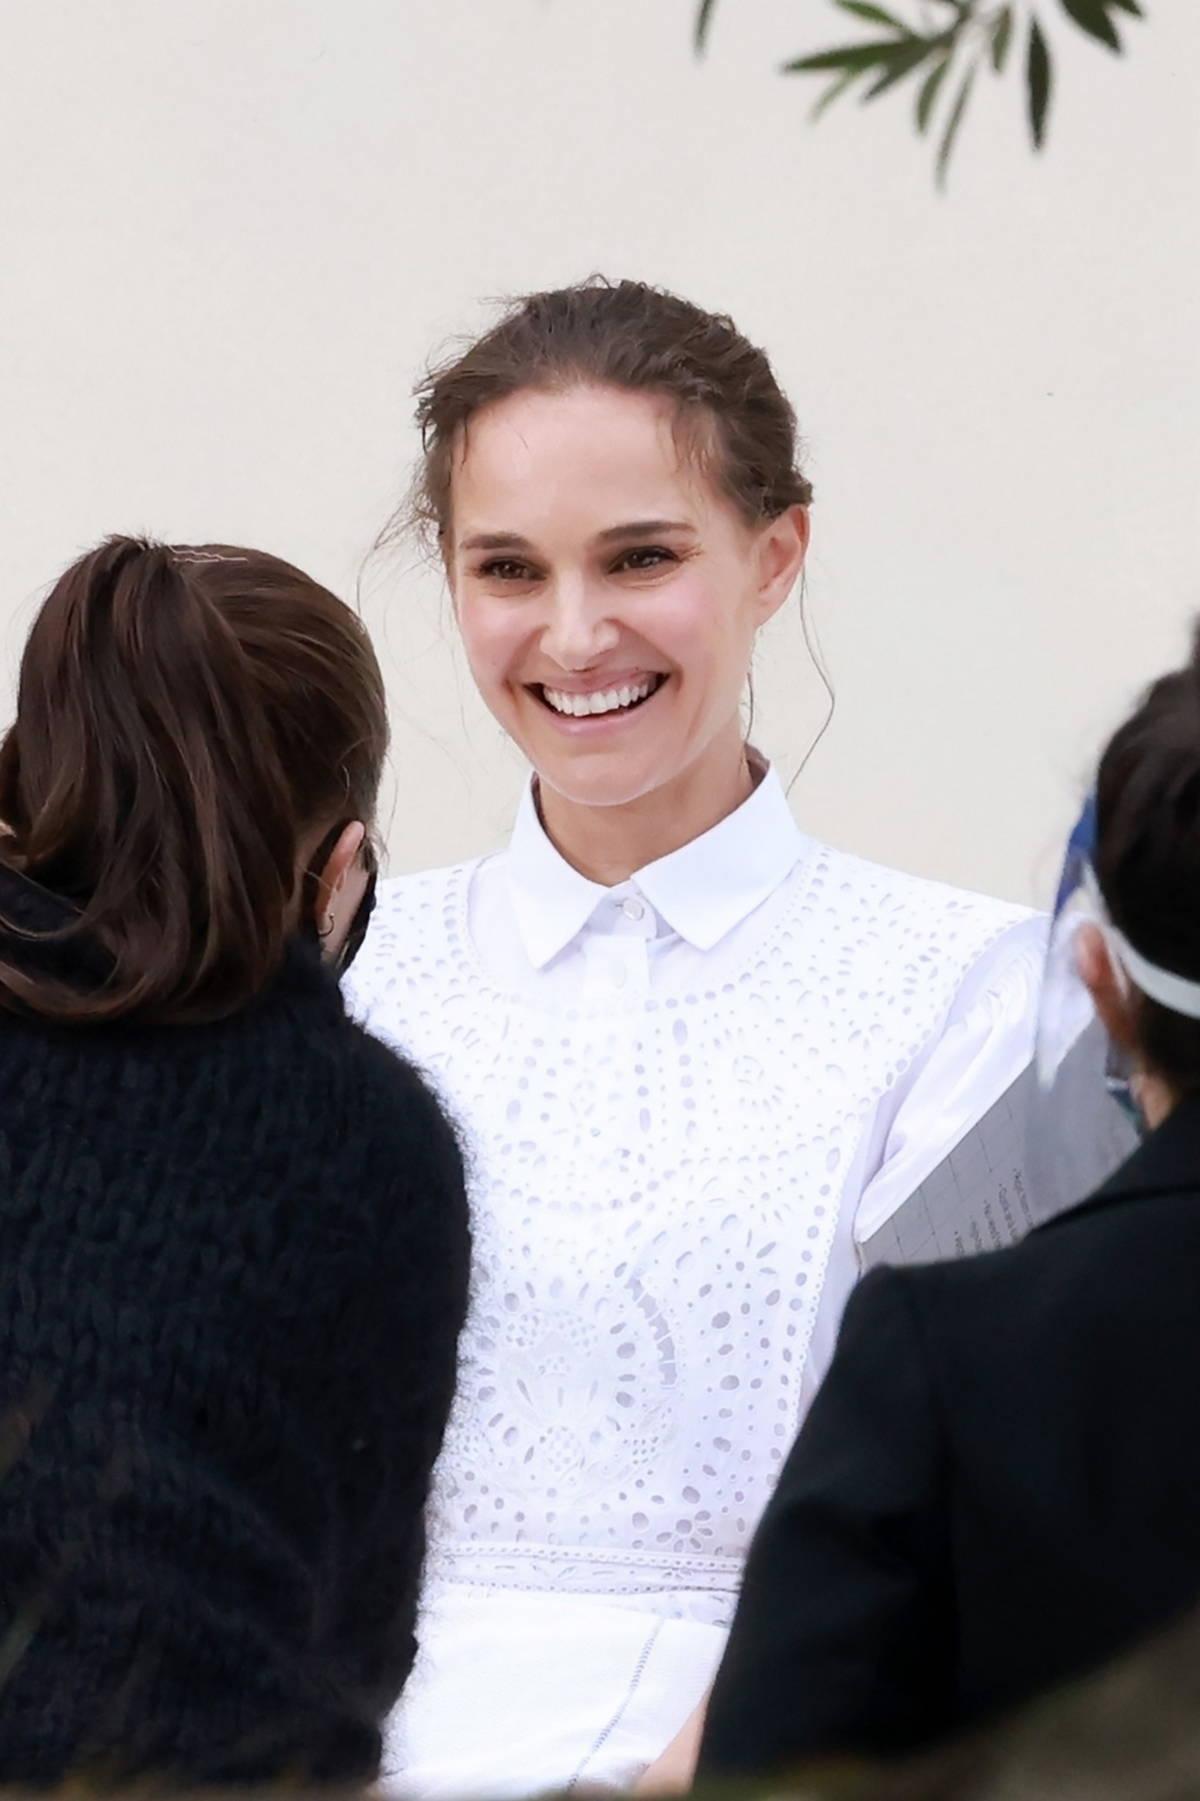 Natalie Portman seen wearing a white doily dress during a photoshoot in Sydney, Australia